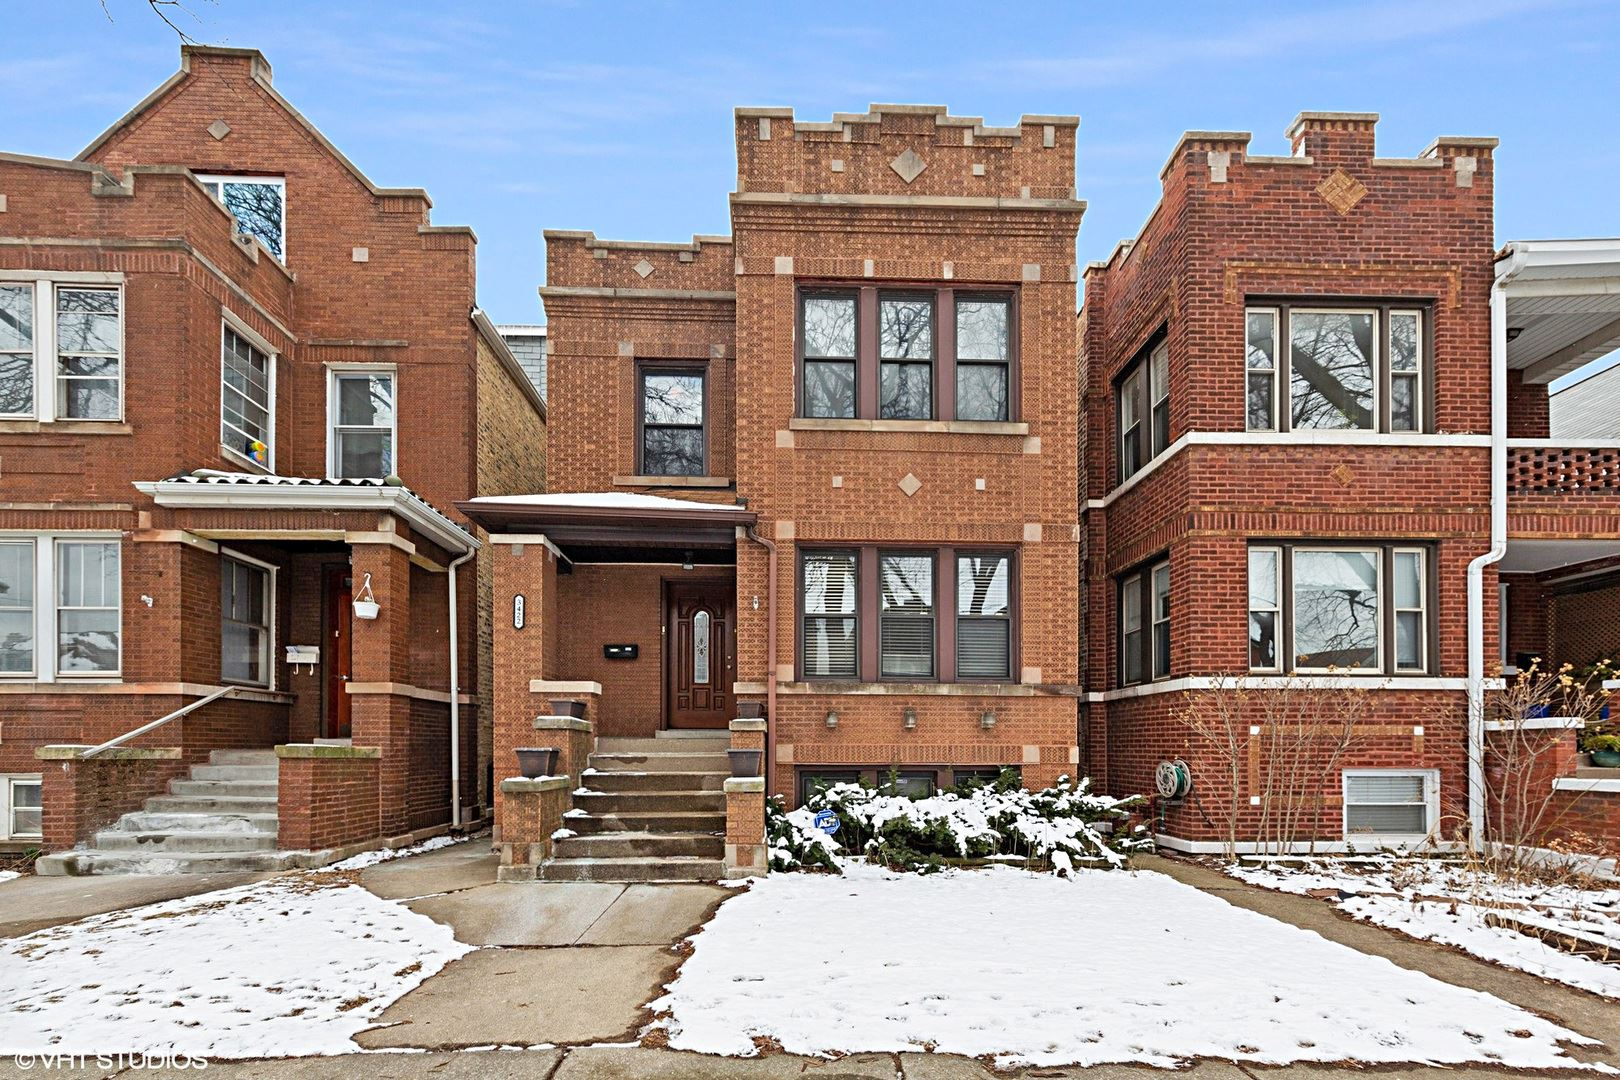 3422 N Hamlin Avenue, Chicago, IL 60618 - #: 10670786